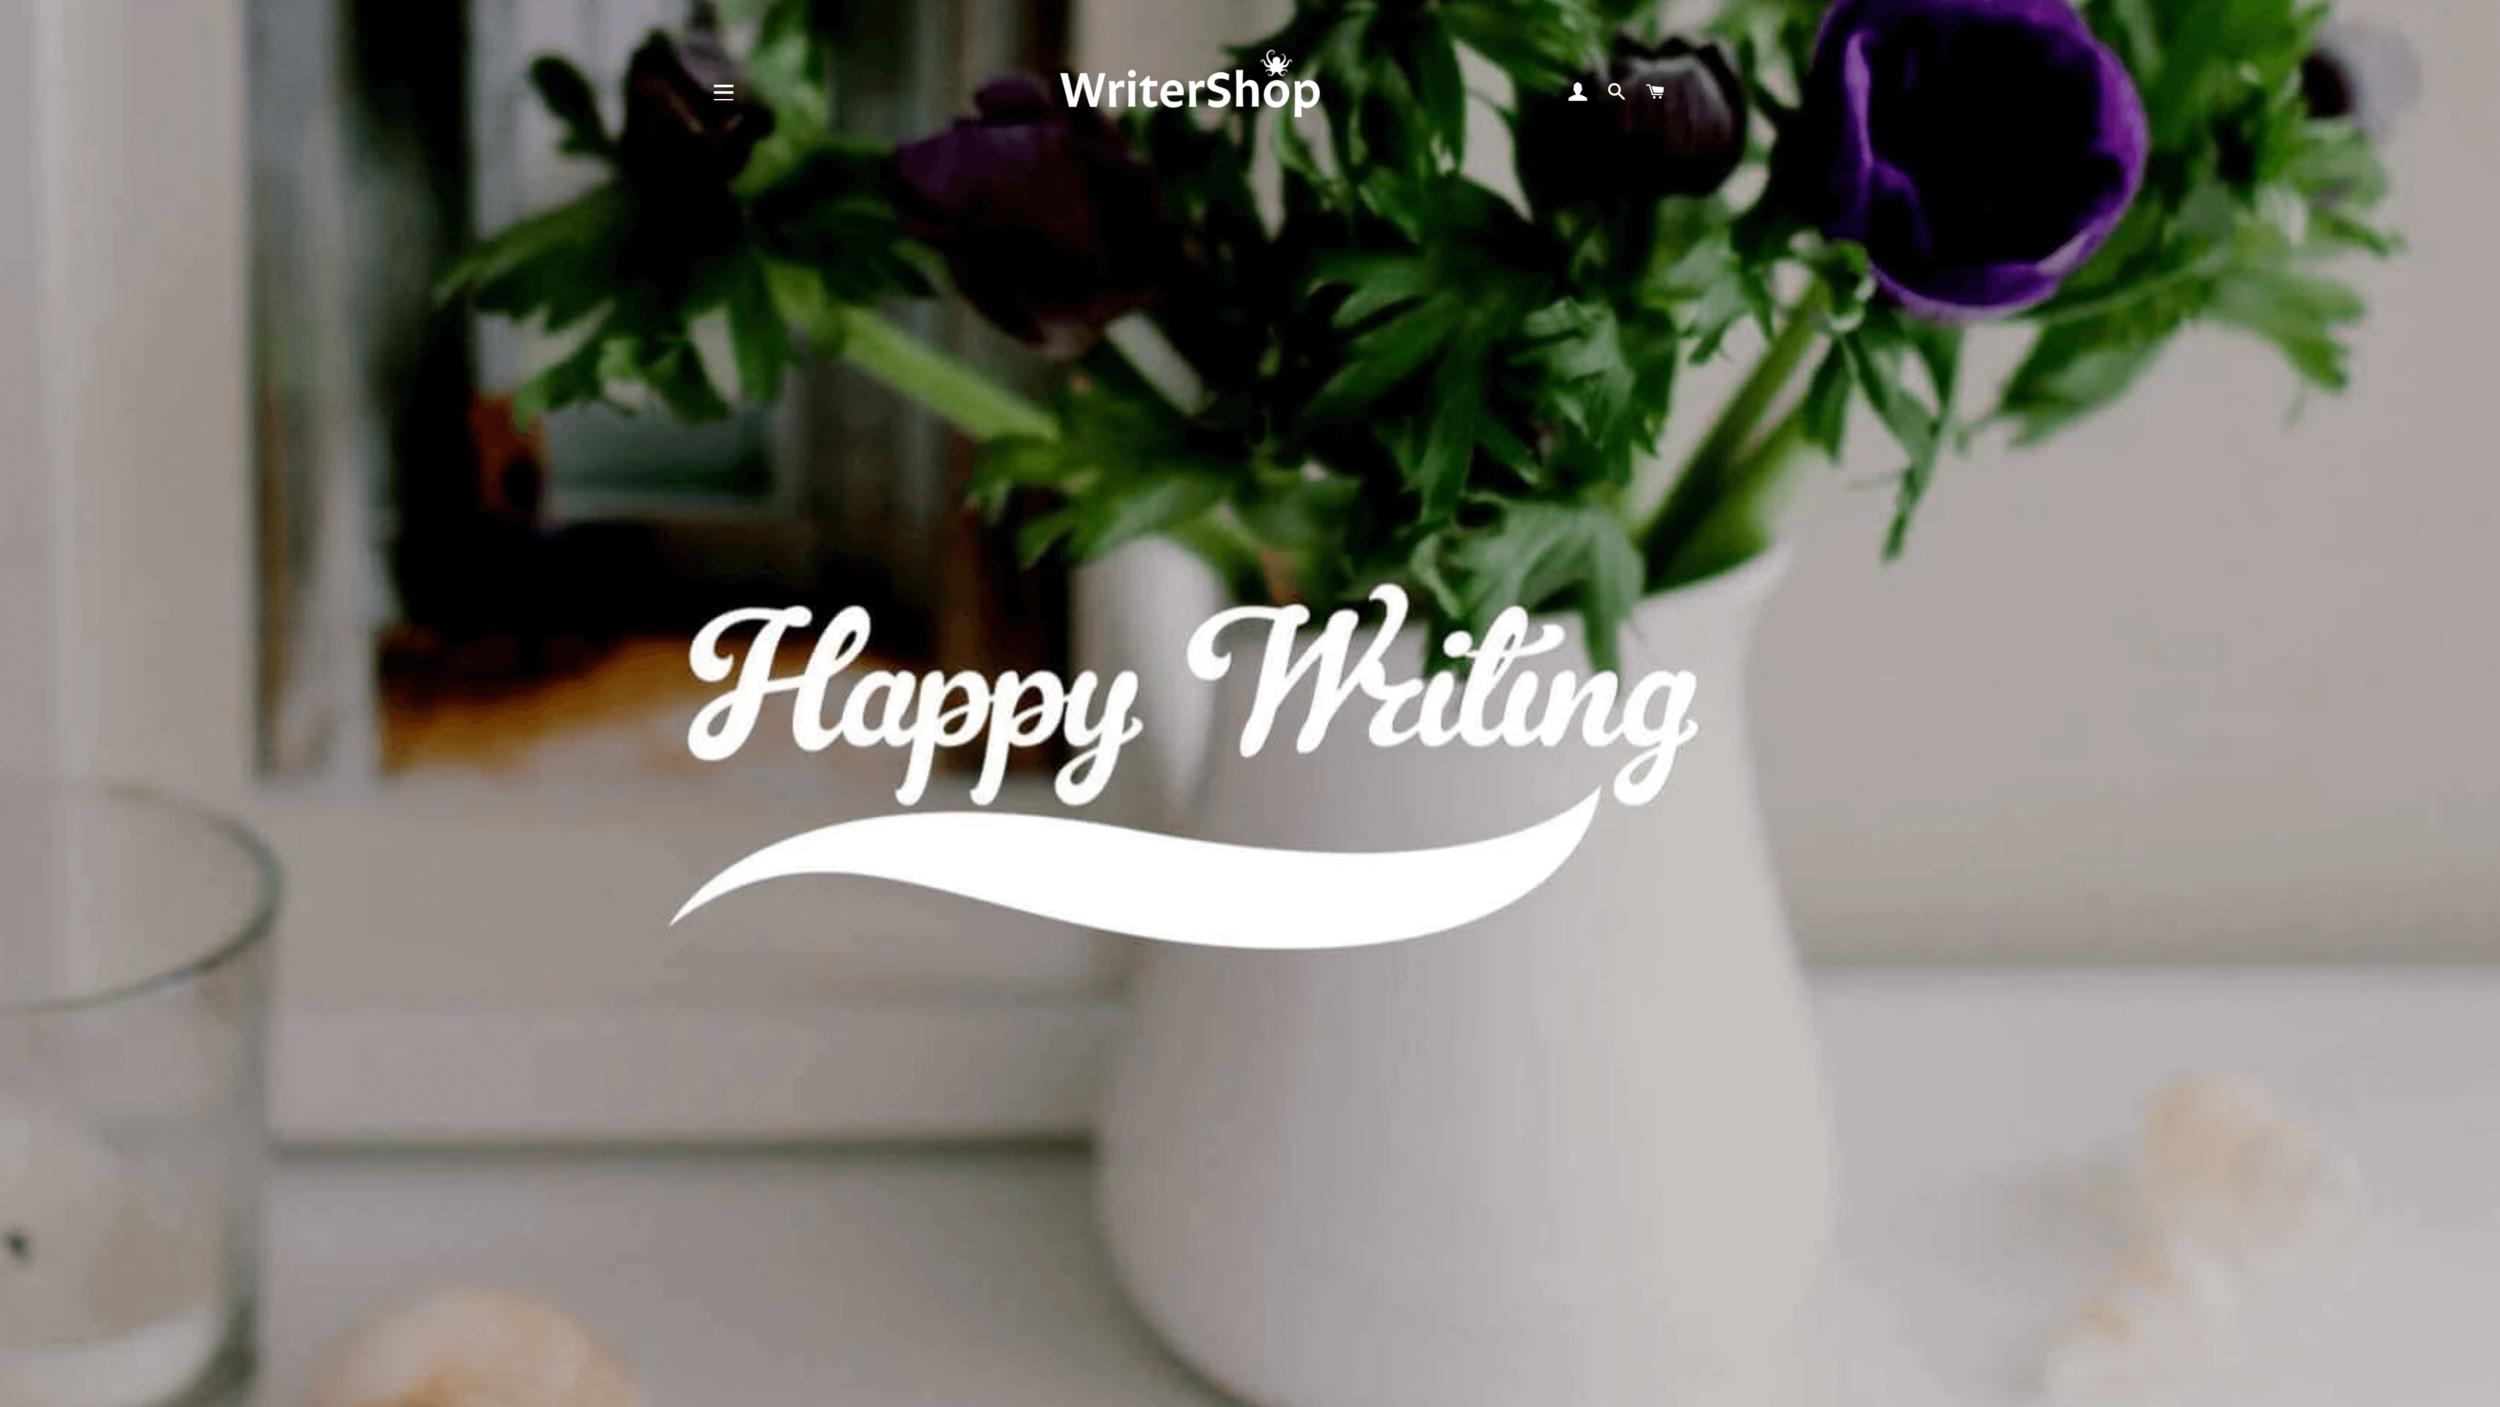 Pop in to Writershop.co.uk